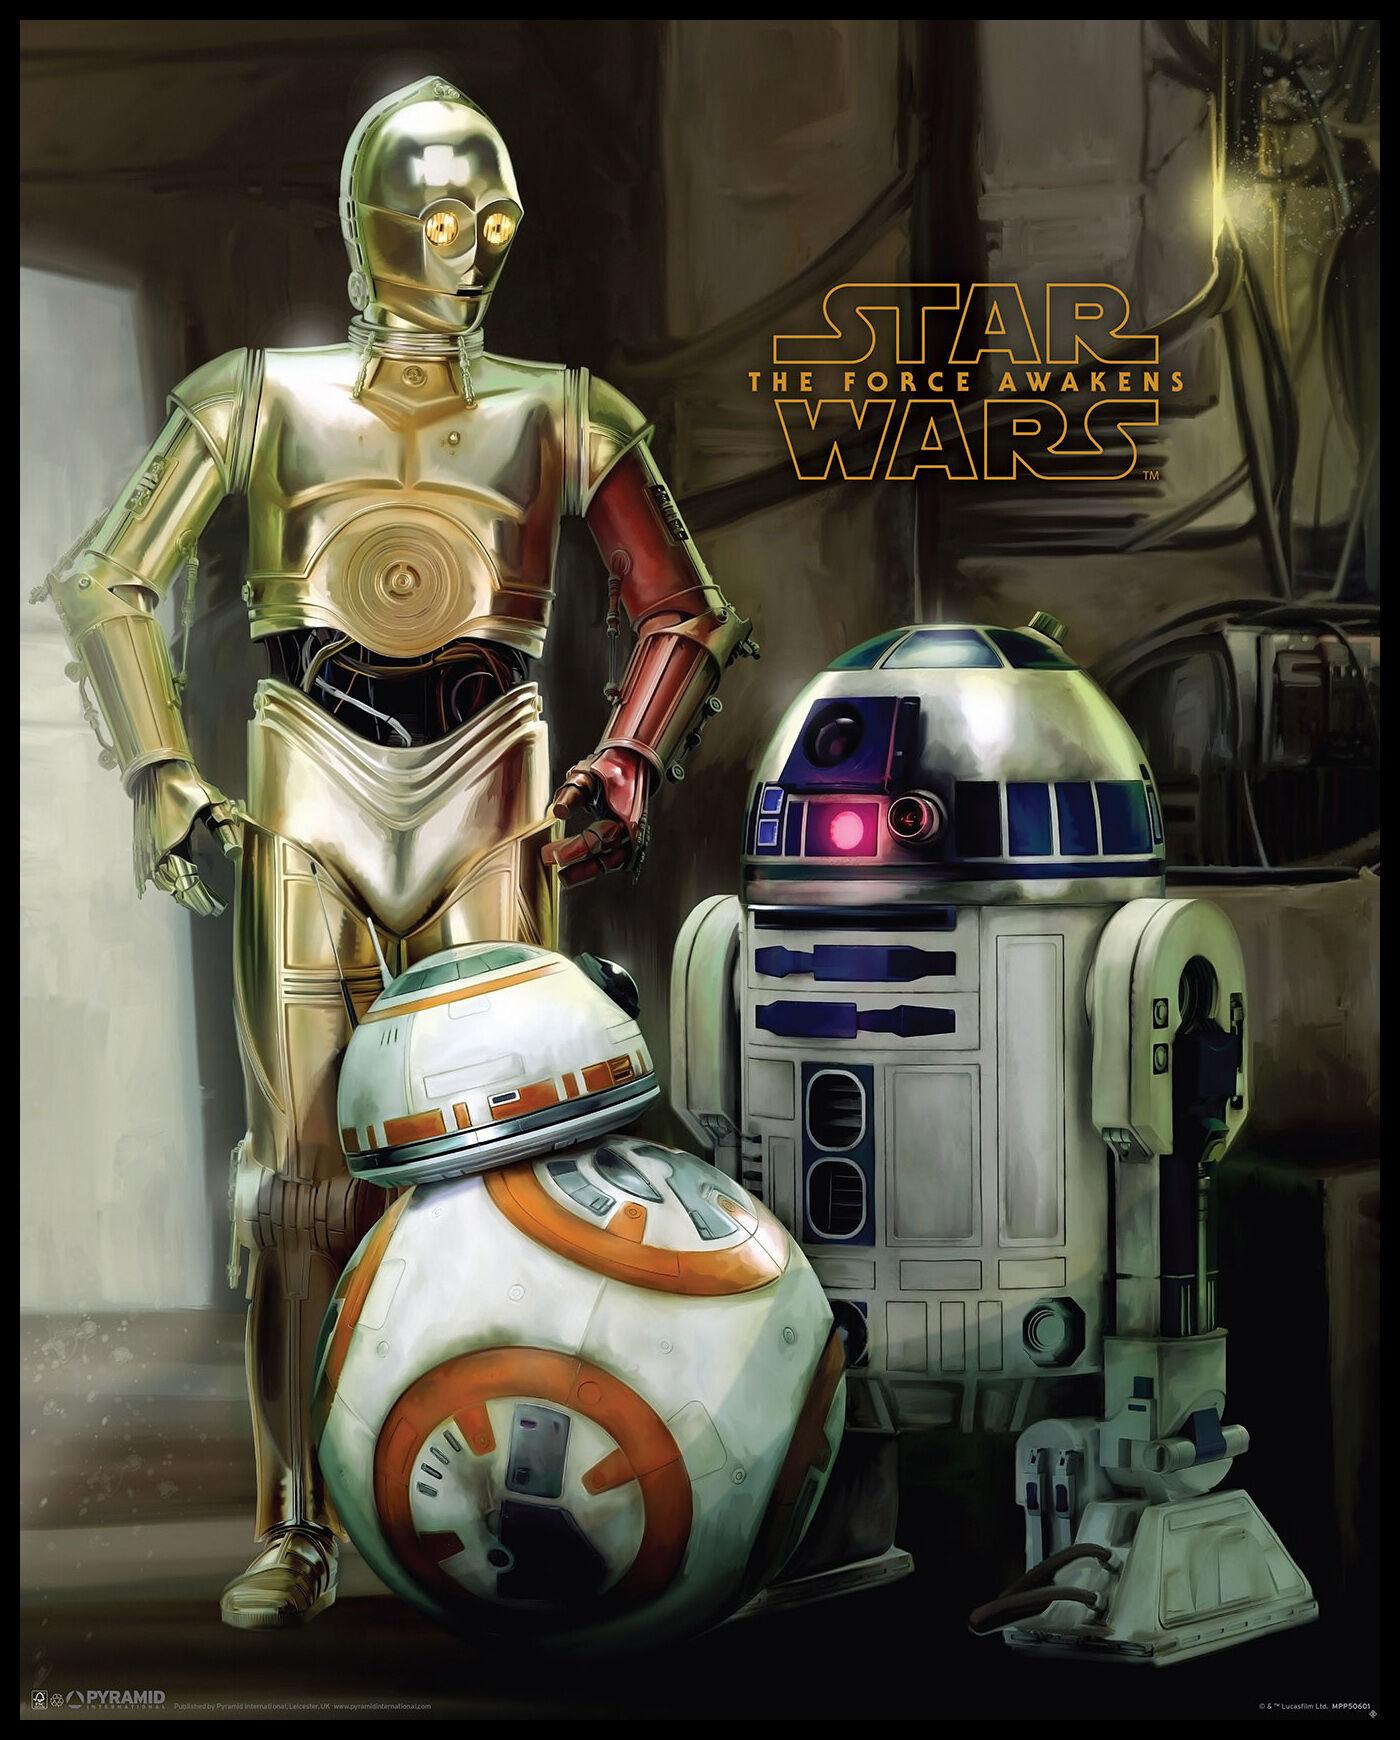 By Agus Star Wars Episode VII - Droids - 40x50 cm